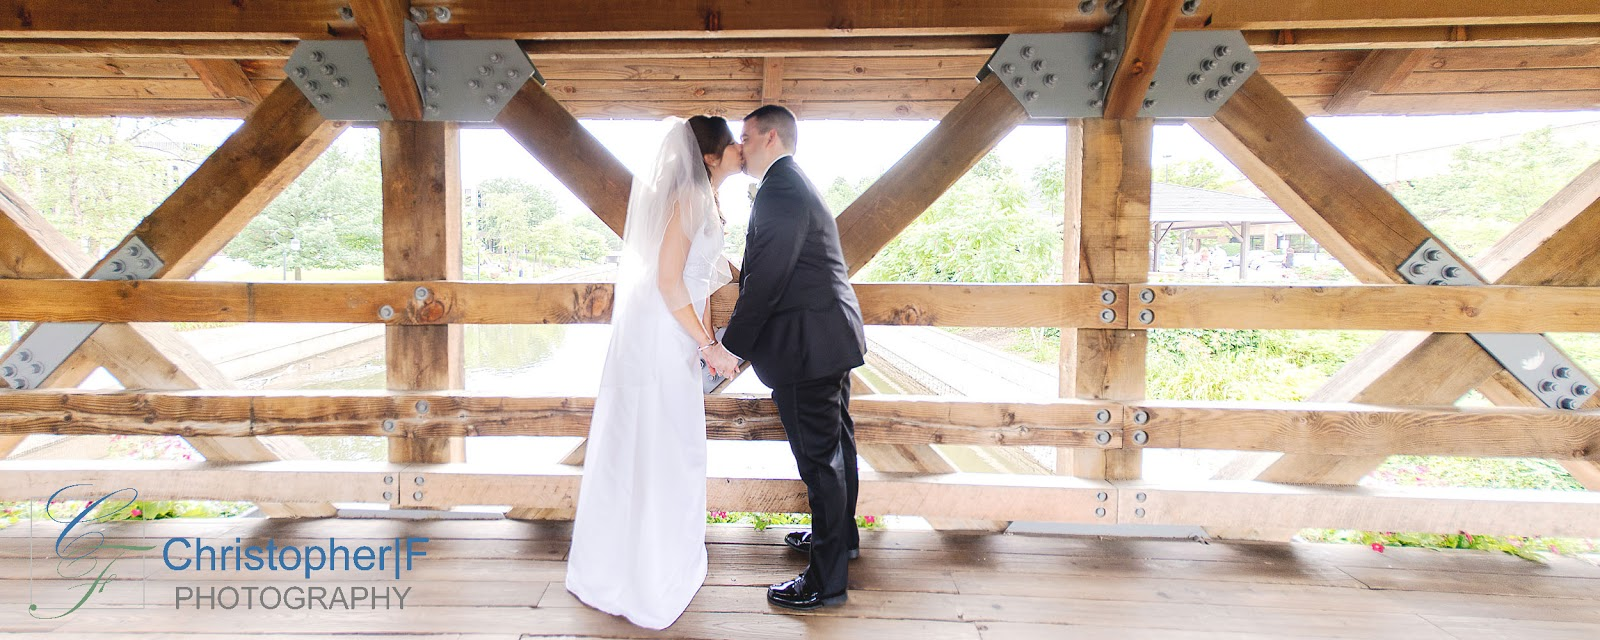 Naperville Wedding Photo